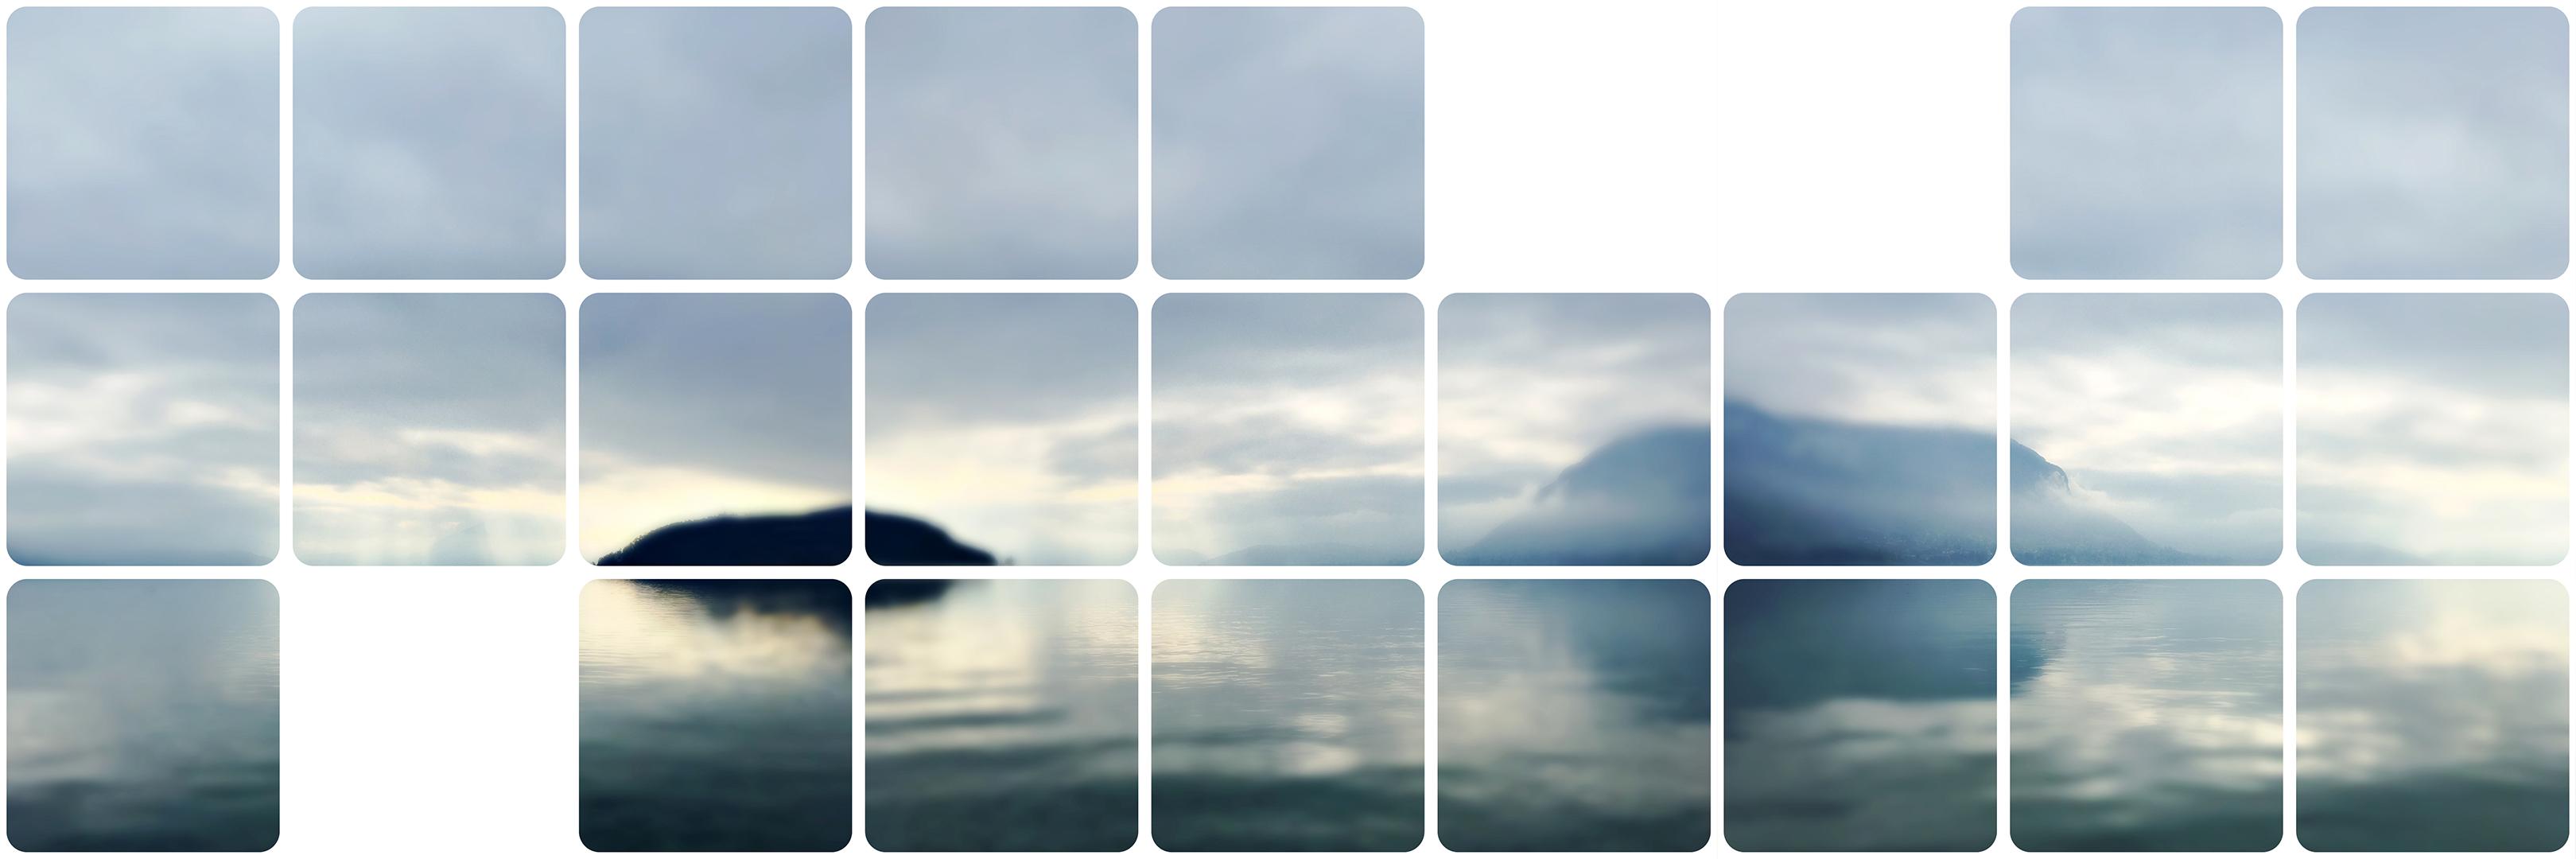 Next horizon 05